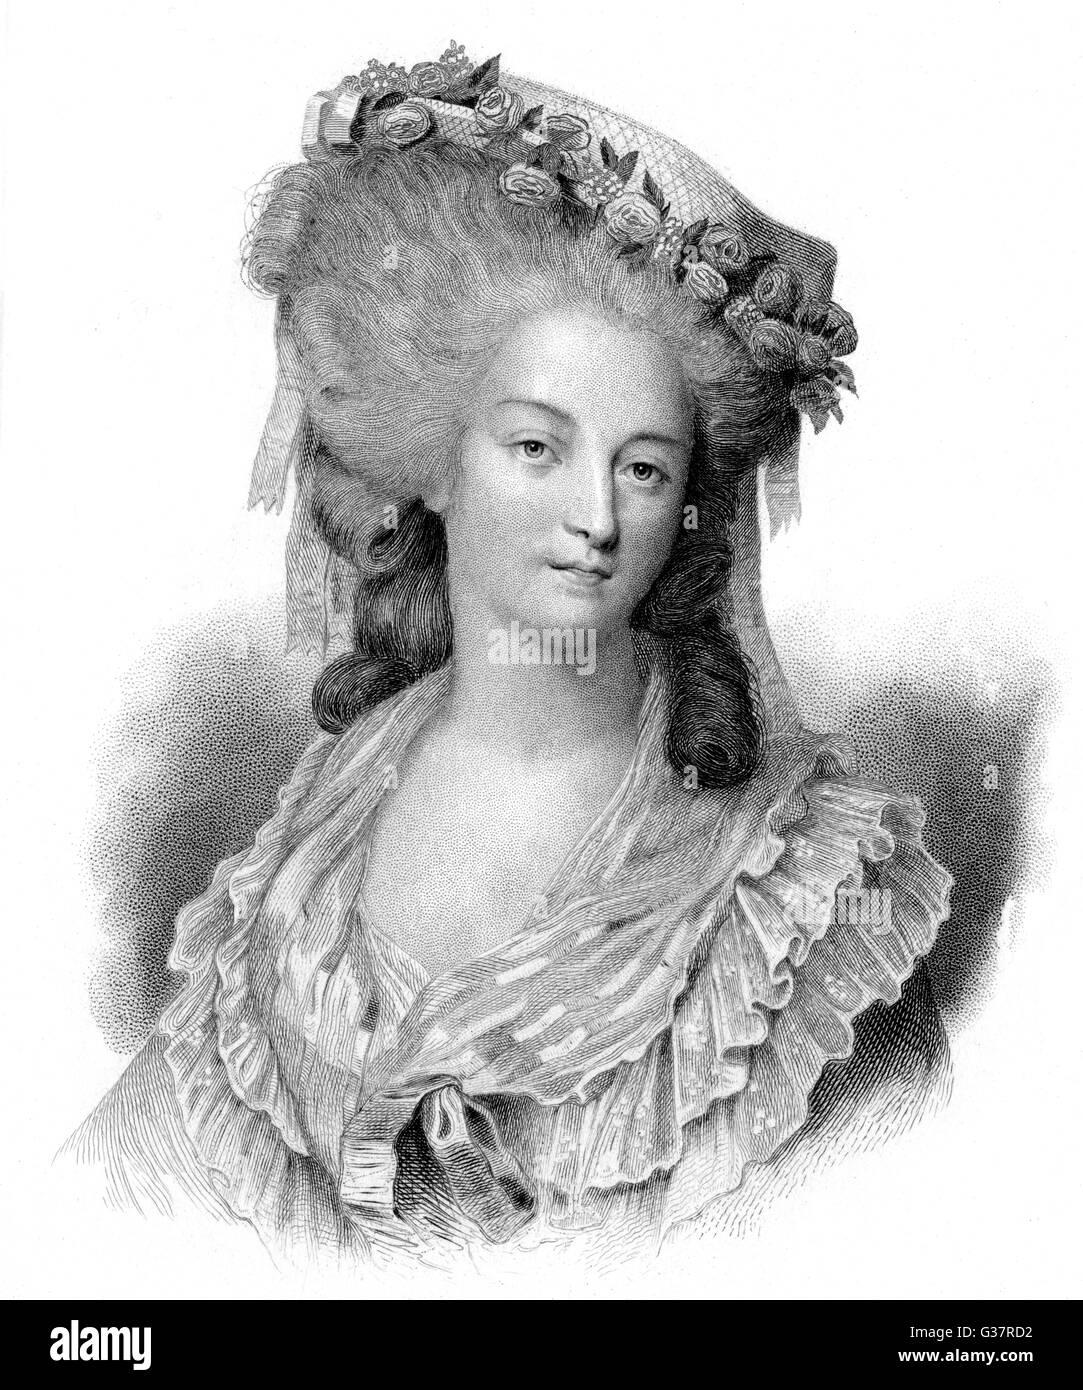 MARIE THERESE LOUISE DE SAVOIE CARIGNAN, princesse de  LAMBALLE French noblewoman, friend of  Marie Antoinette, - Stock Image